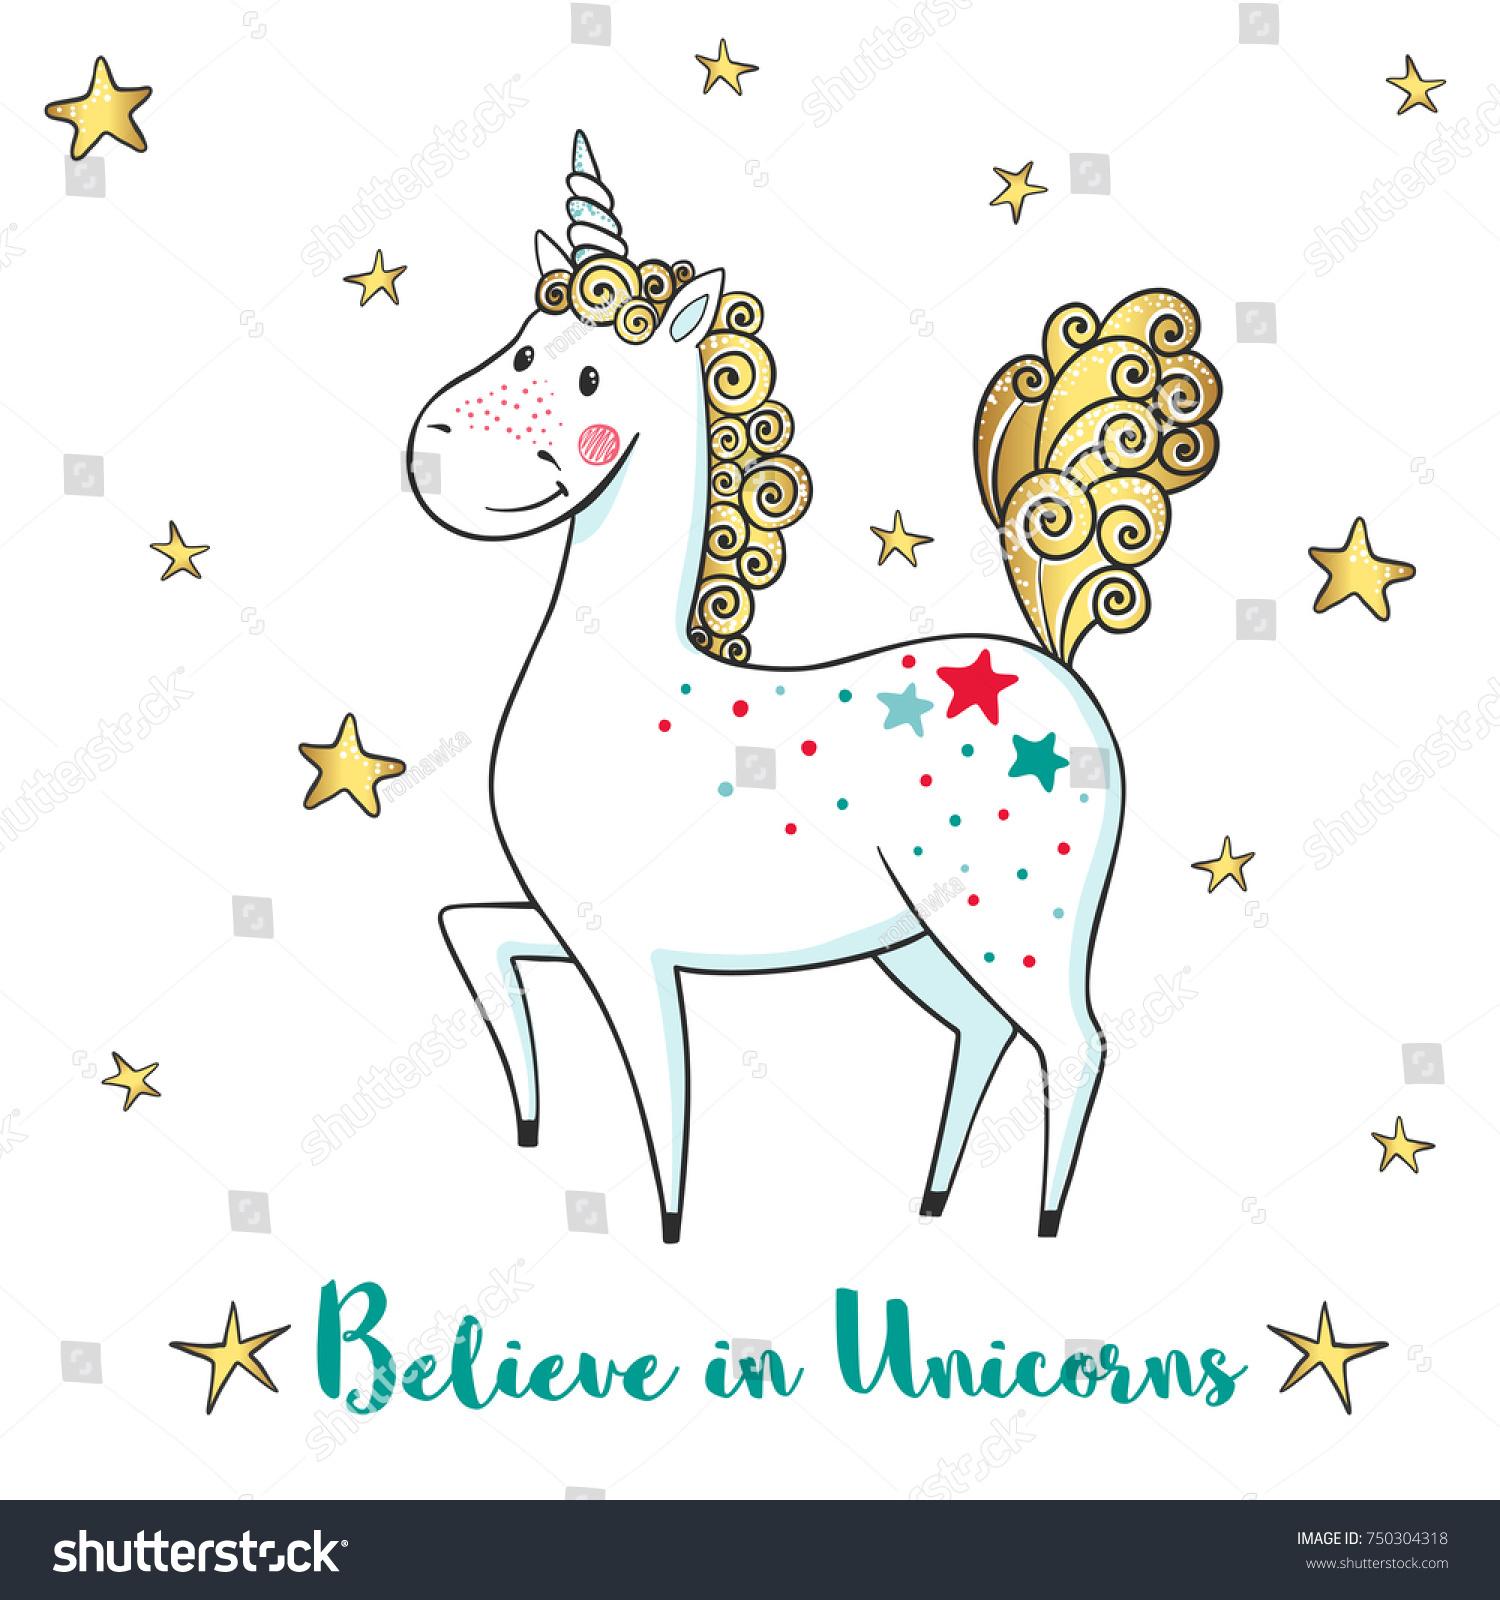 Greeting Card With Cute Unicorn And Stars Cartoon Hand Drawn